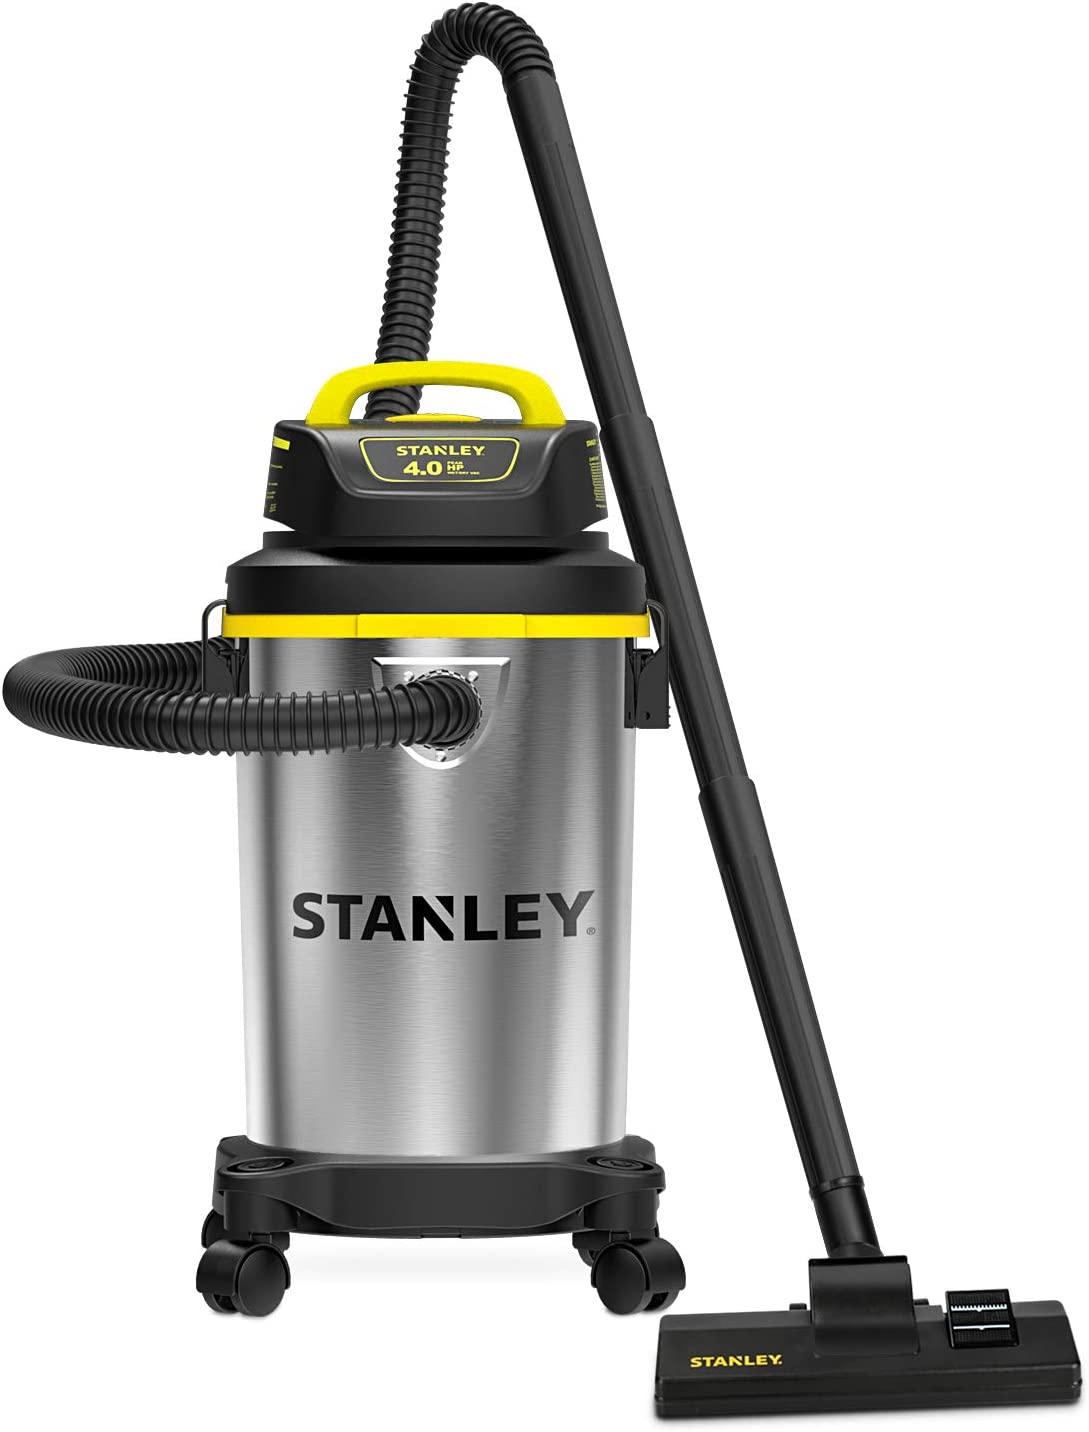 Stanley 4 Gallon Wet Dry Vacuum , 4 Peak HP Stainless Steel Portable Shop Vac, Multifunctional Shop Vacuum W/ 4 Horsepower Motor for Job Site,Garage,Basement,Van,Workshop: Home Improvement